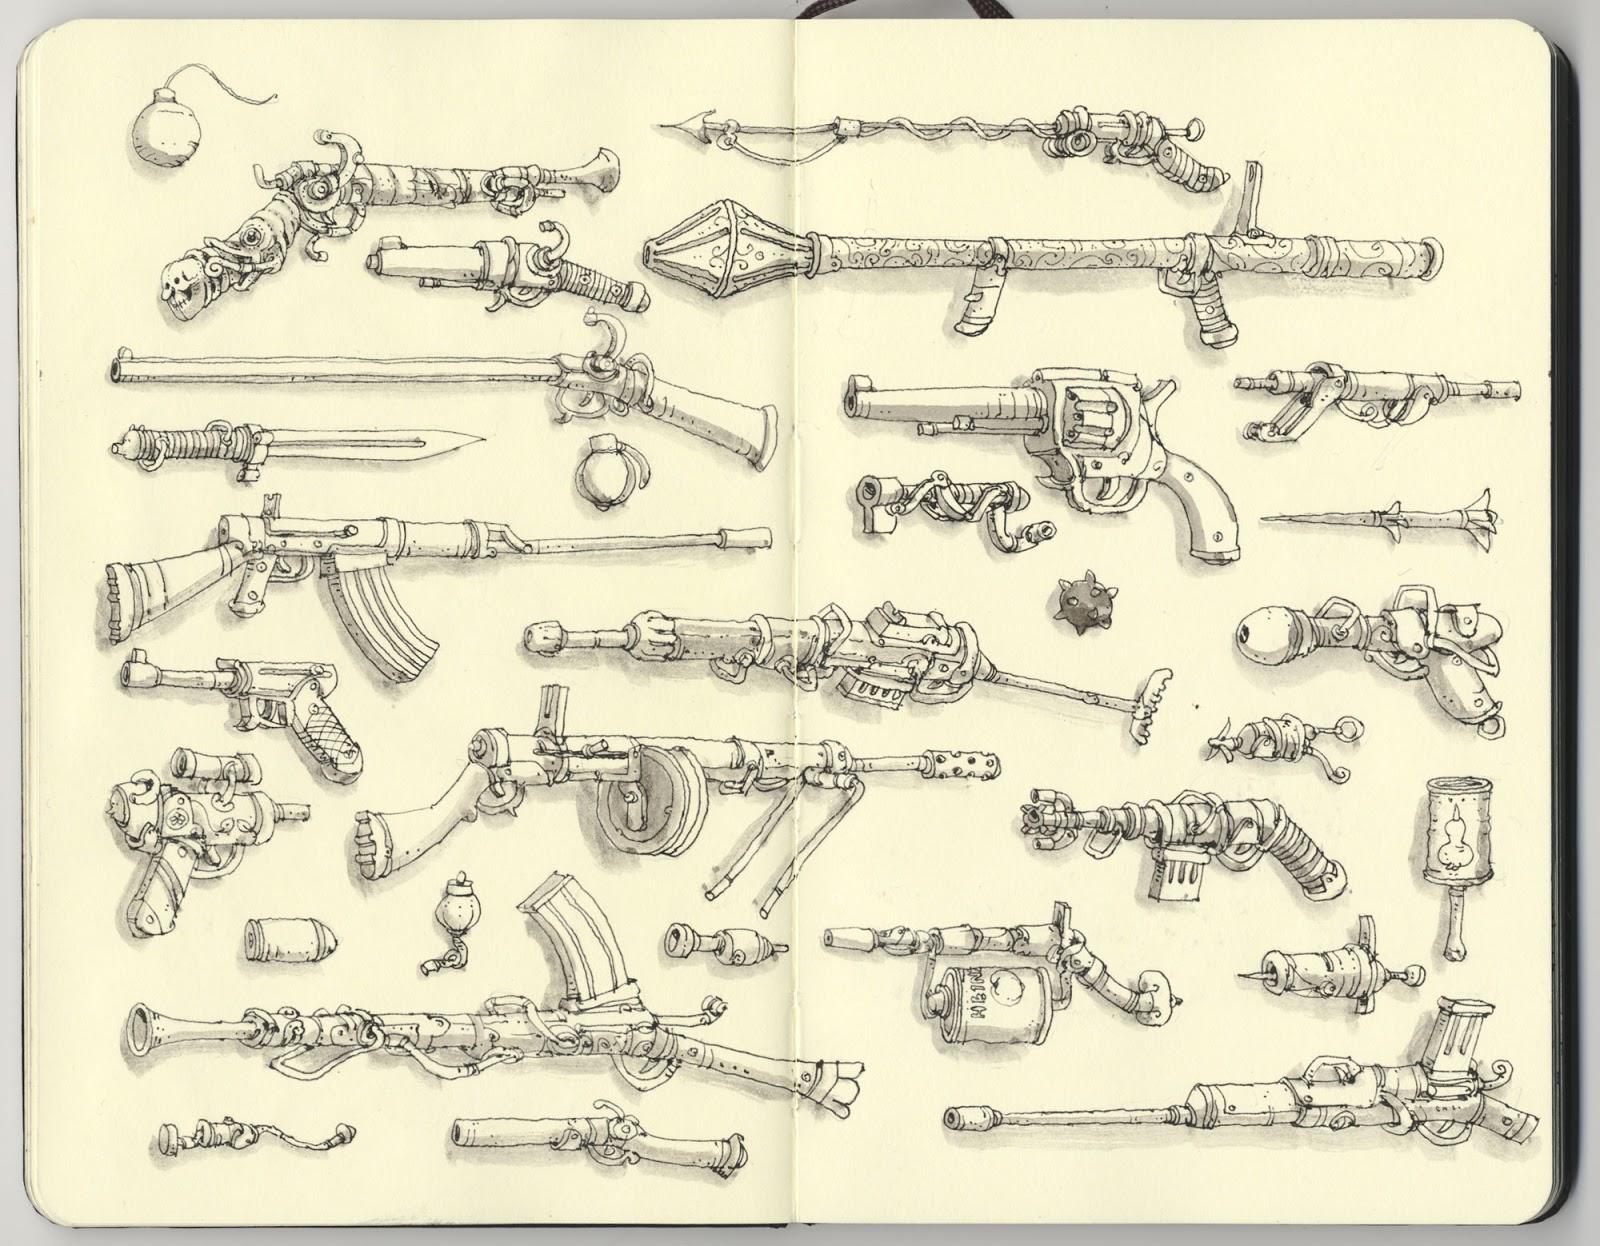 Mattias Adolfsson sketch illustration 9